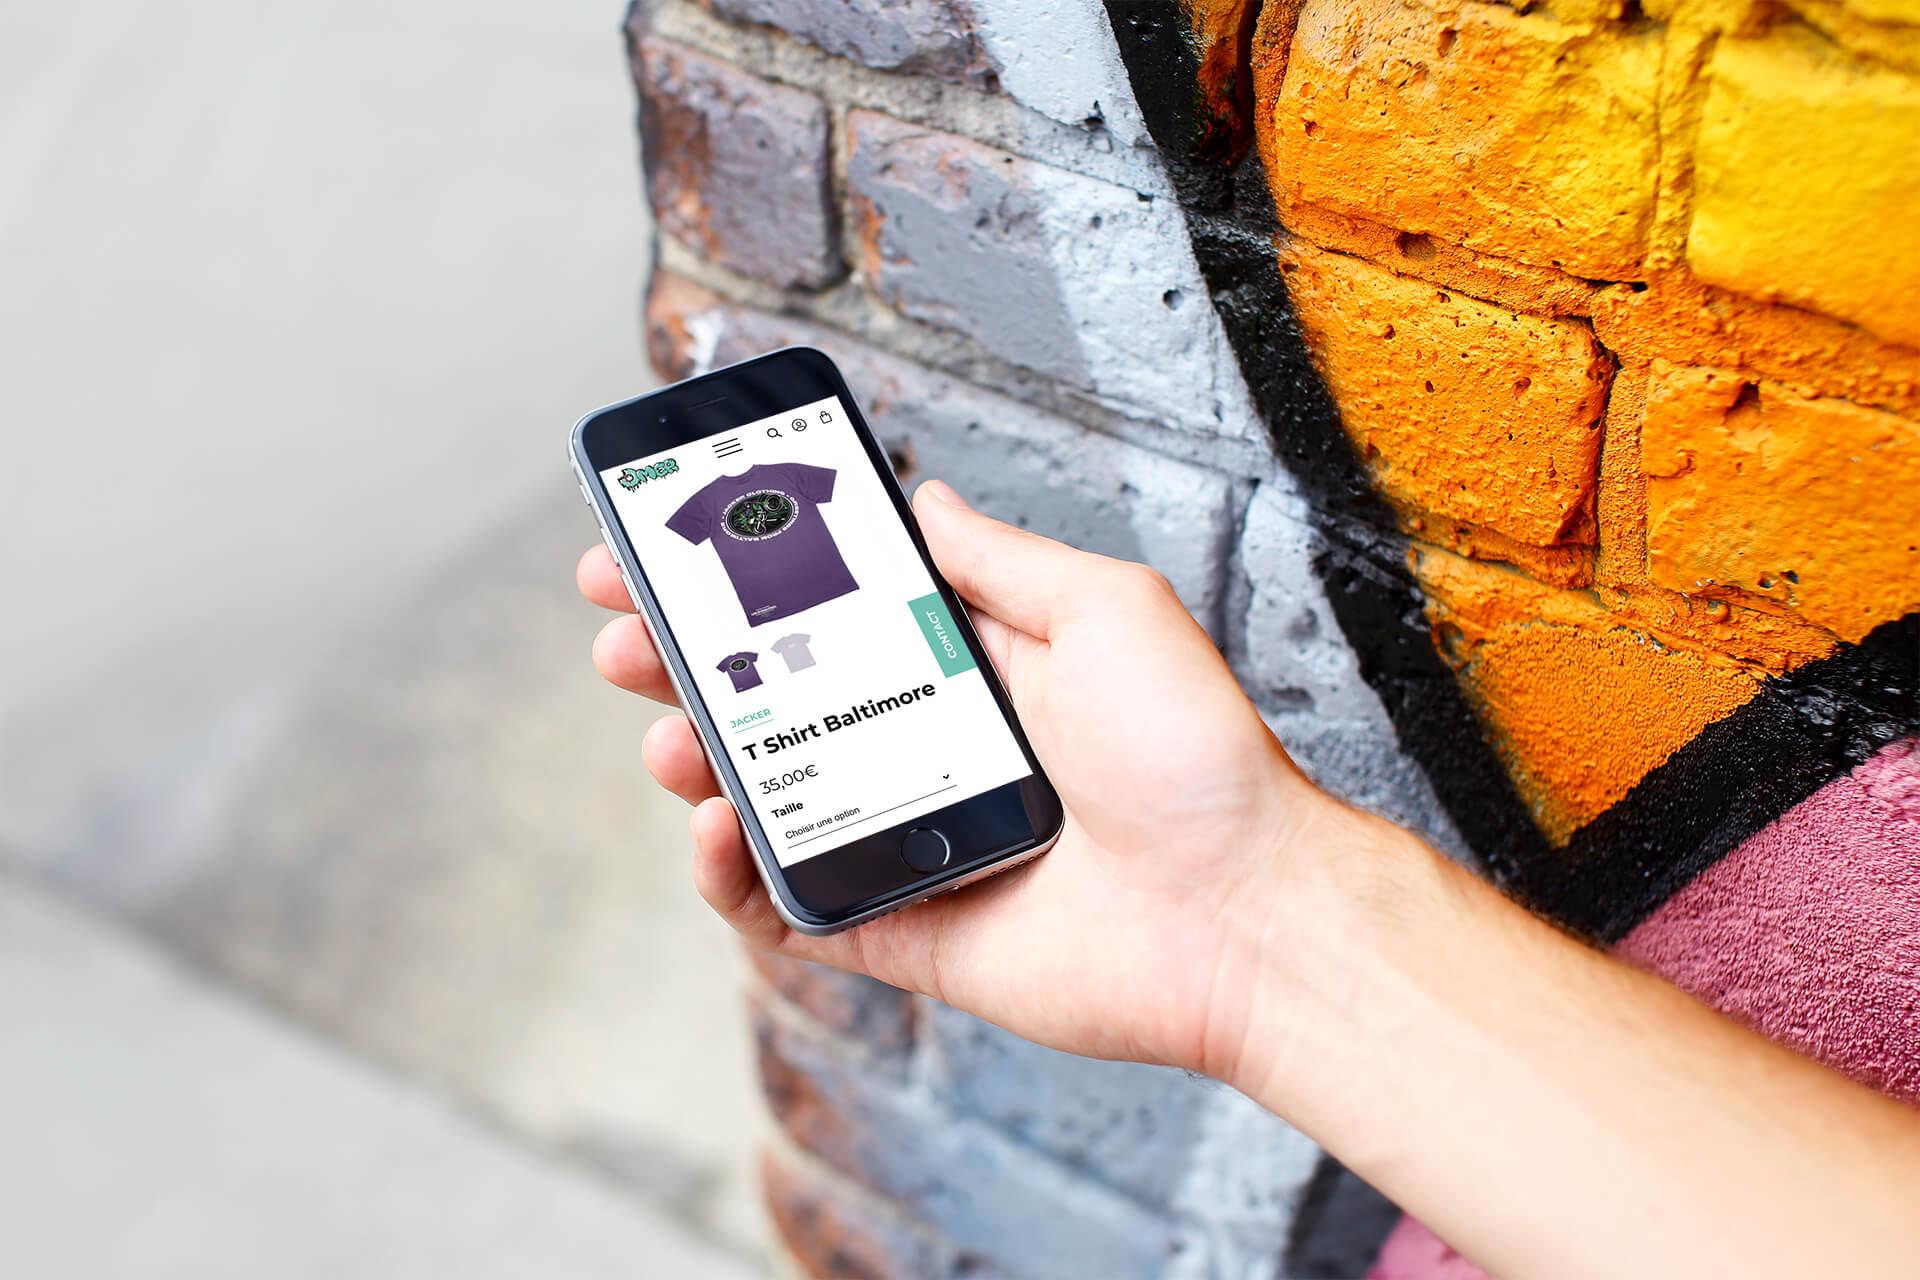 lezardscreation agence communication publicite vosges remiremont omer omer produit t shirt baltimore (iphone )